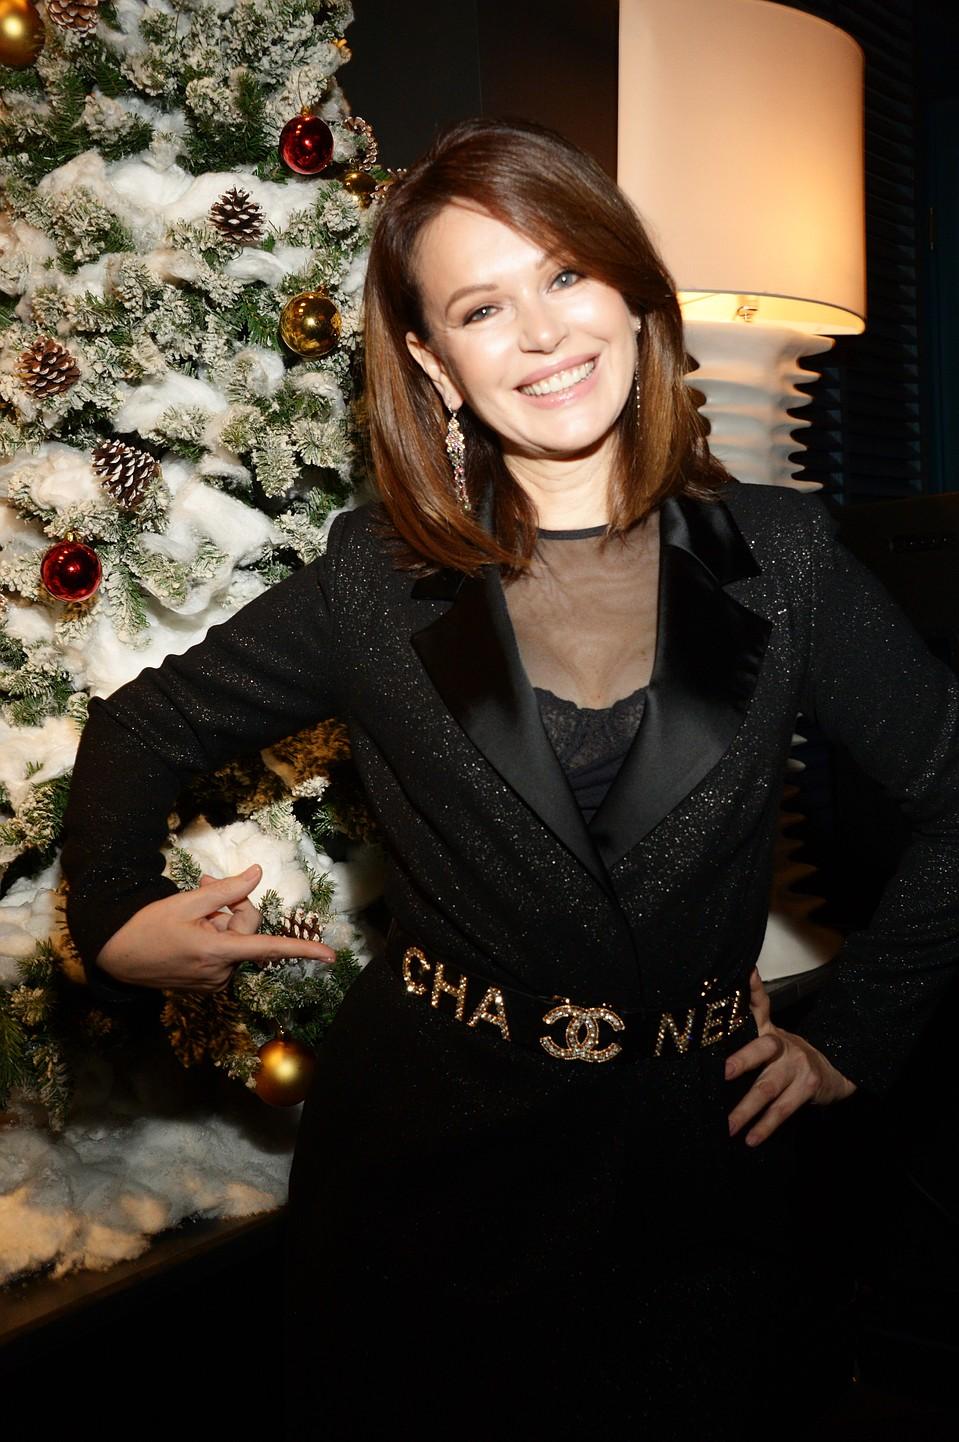 On New Year's Eve, Irina flew to Bali. Photo: GLOBAL LOOK PRESS